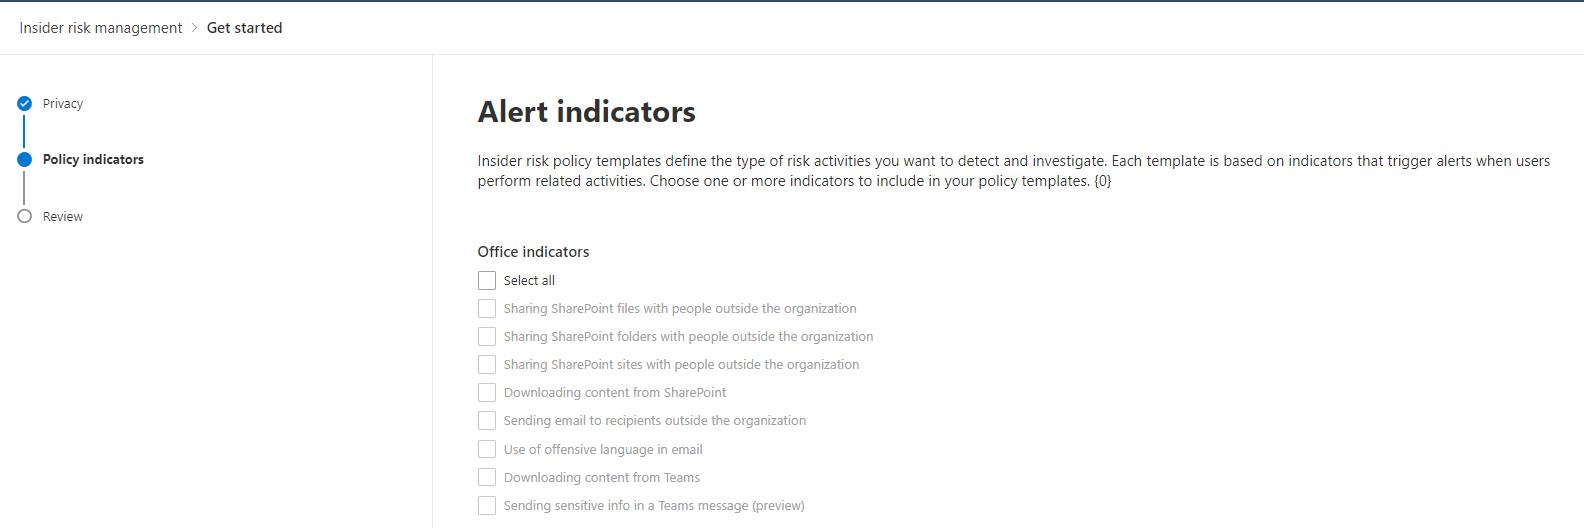 Microsoft 365 Insider Risk Management Alert Indicators